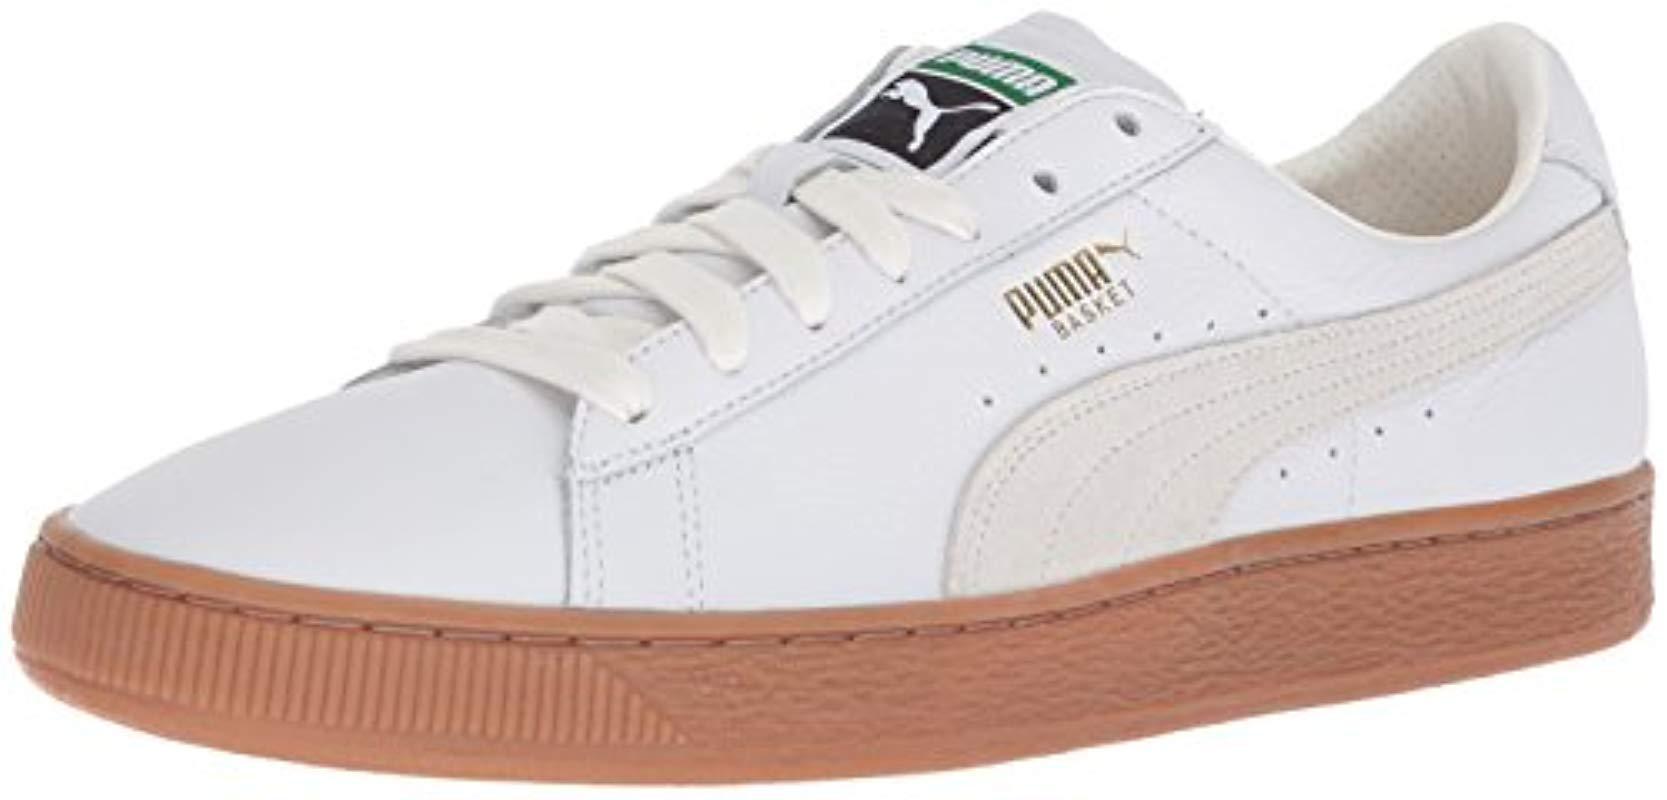 7da0ebc1237 Lyst - PUMA Basket Classic Gum Deluxe Sneaker in White for Men ...